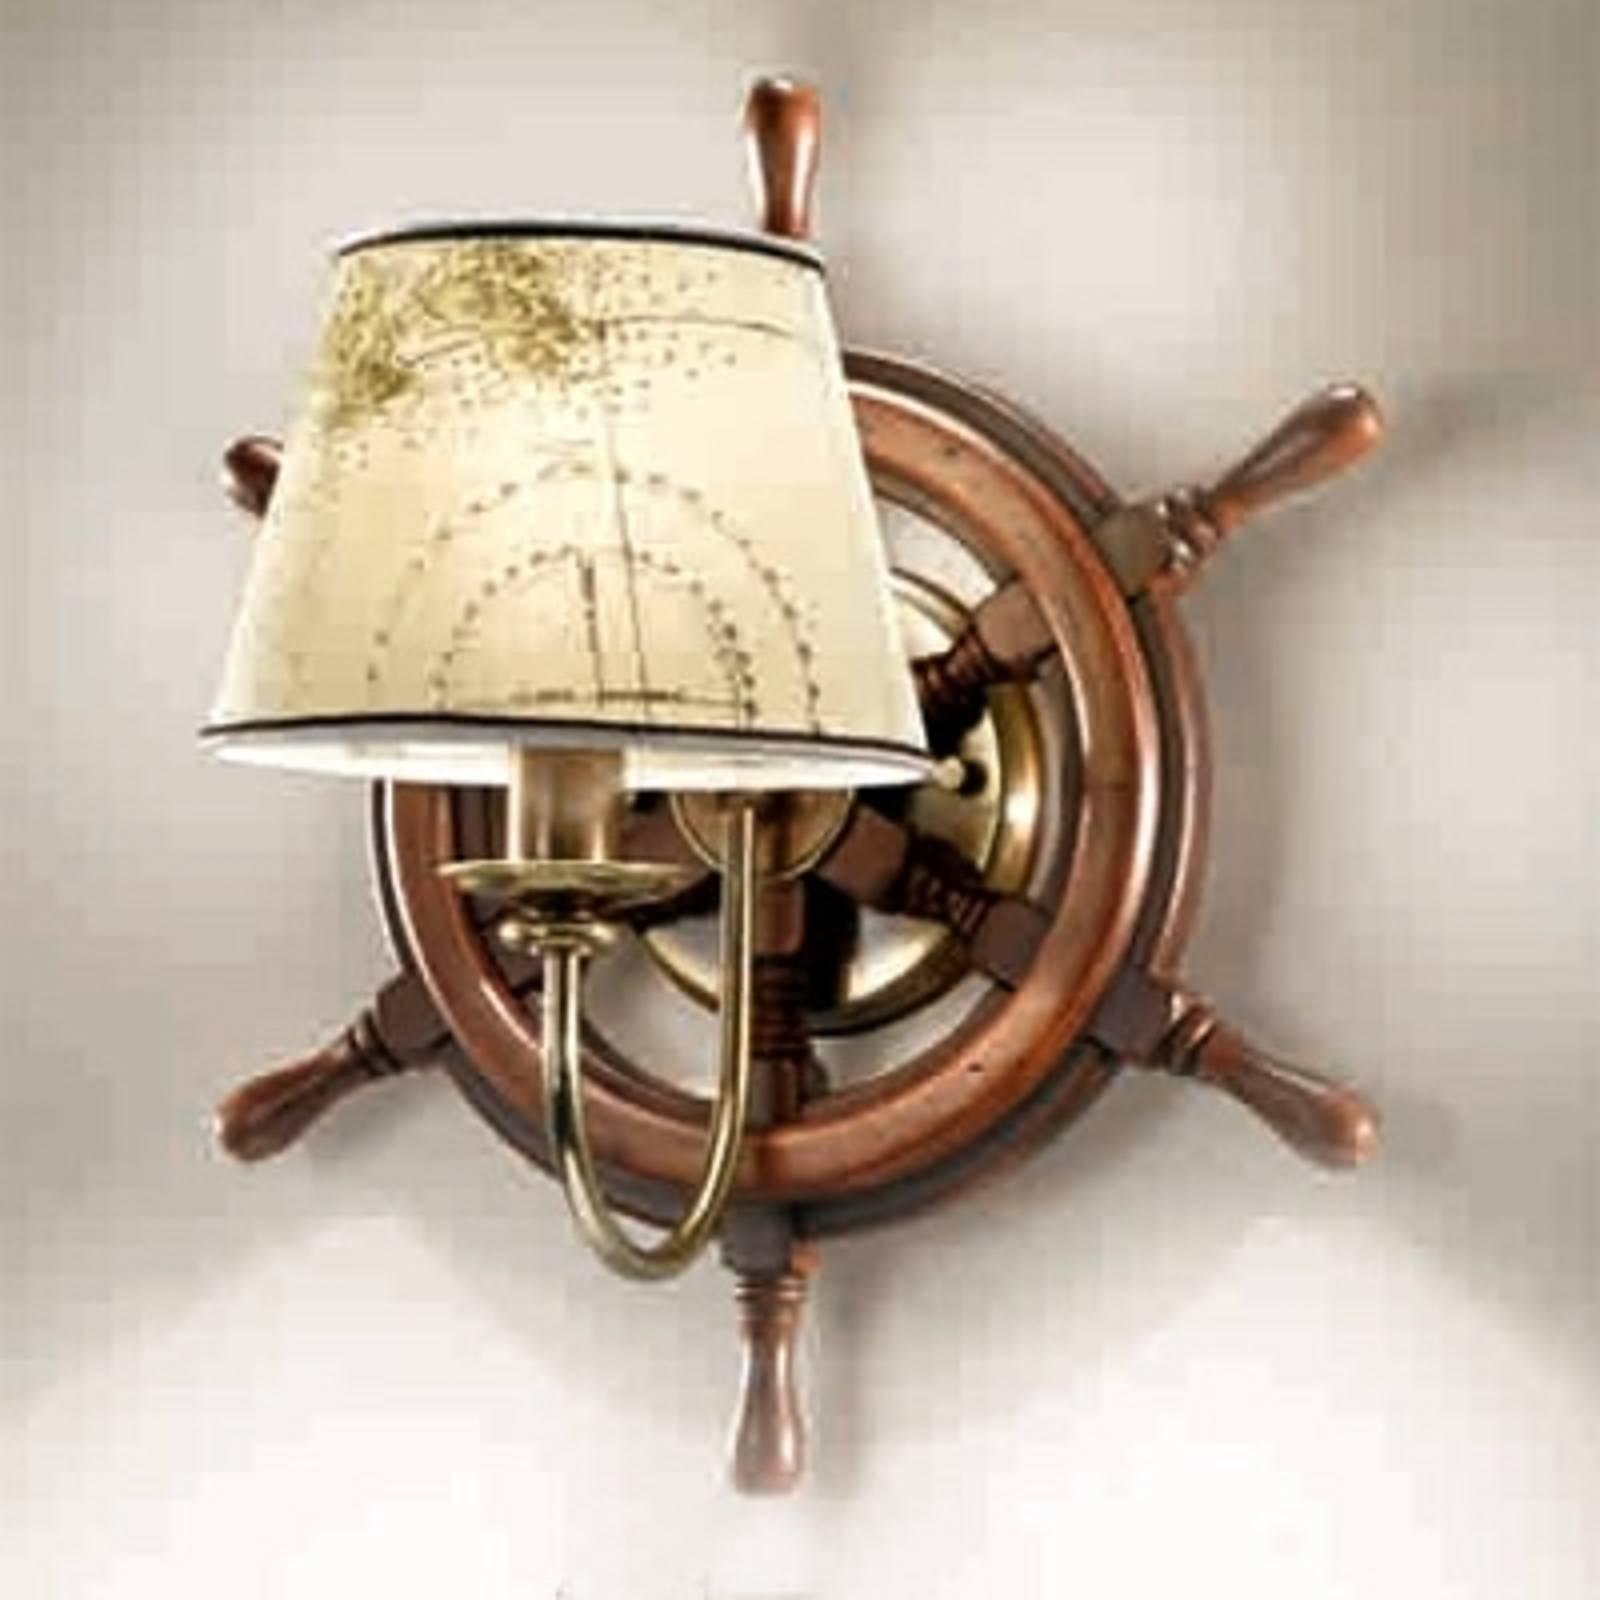 Interessant gevormde wandlamp Porto 1-lichts